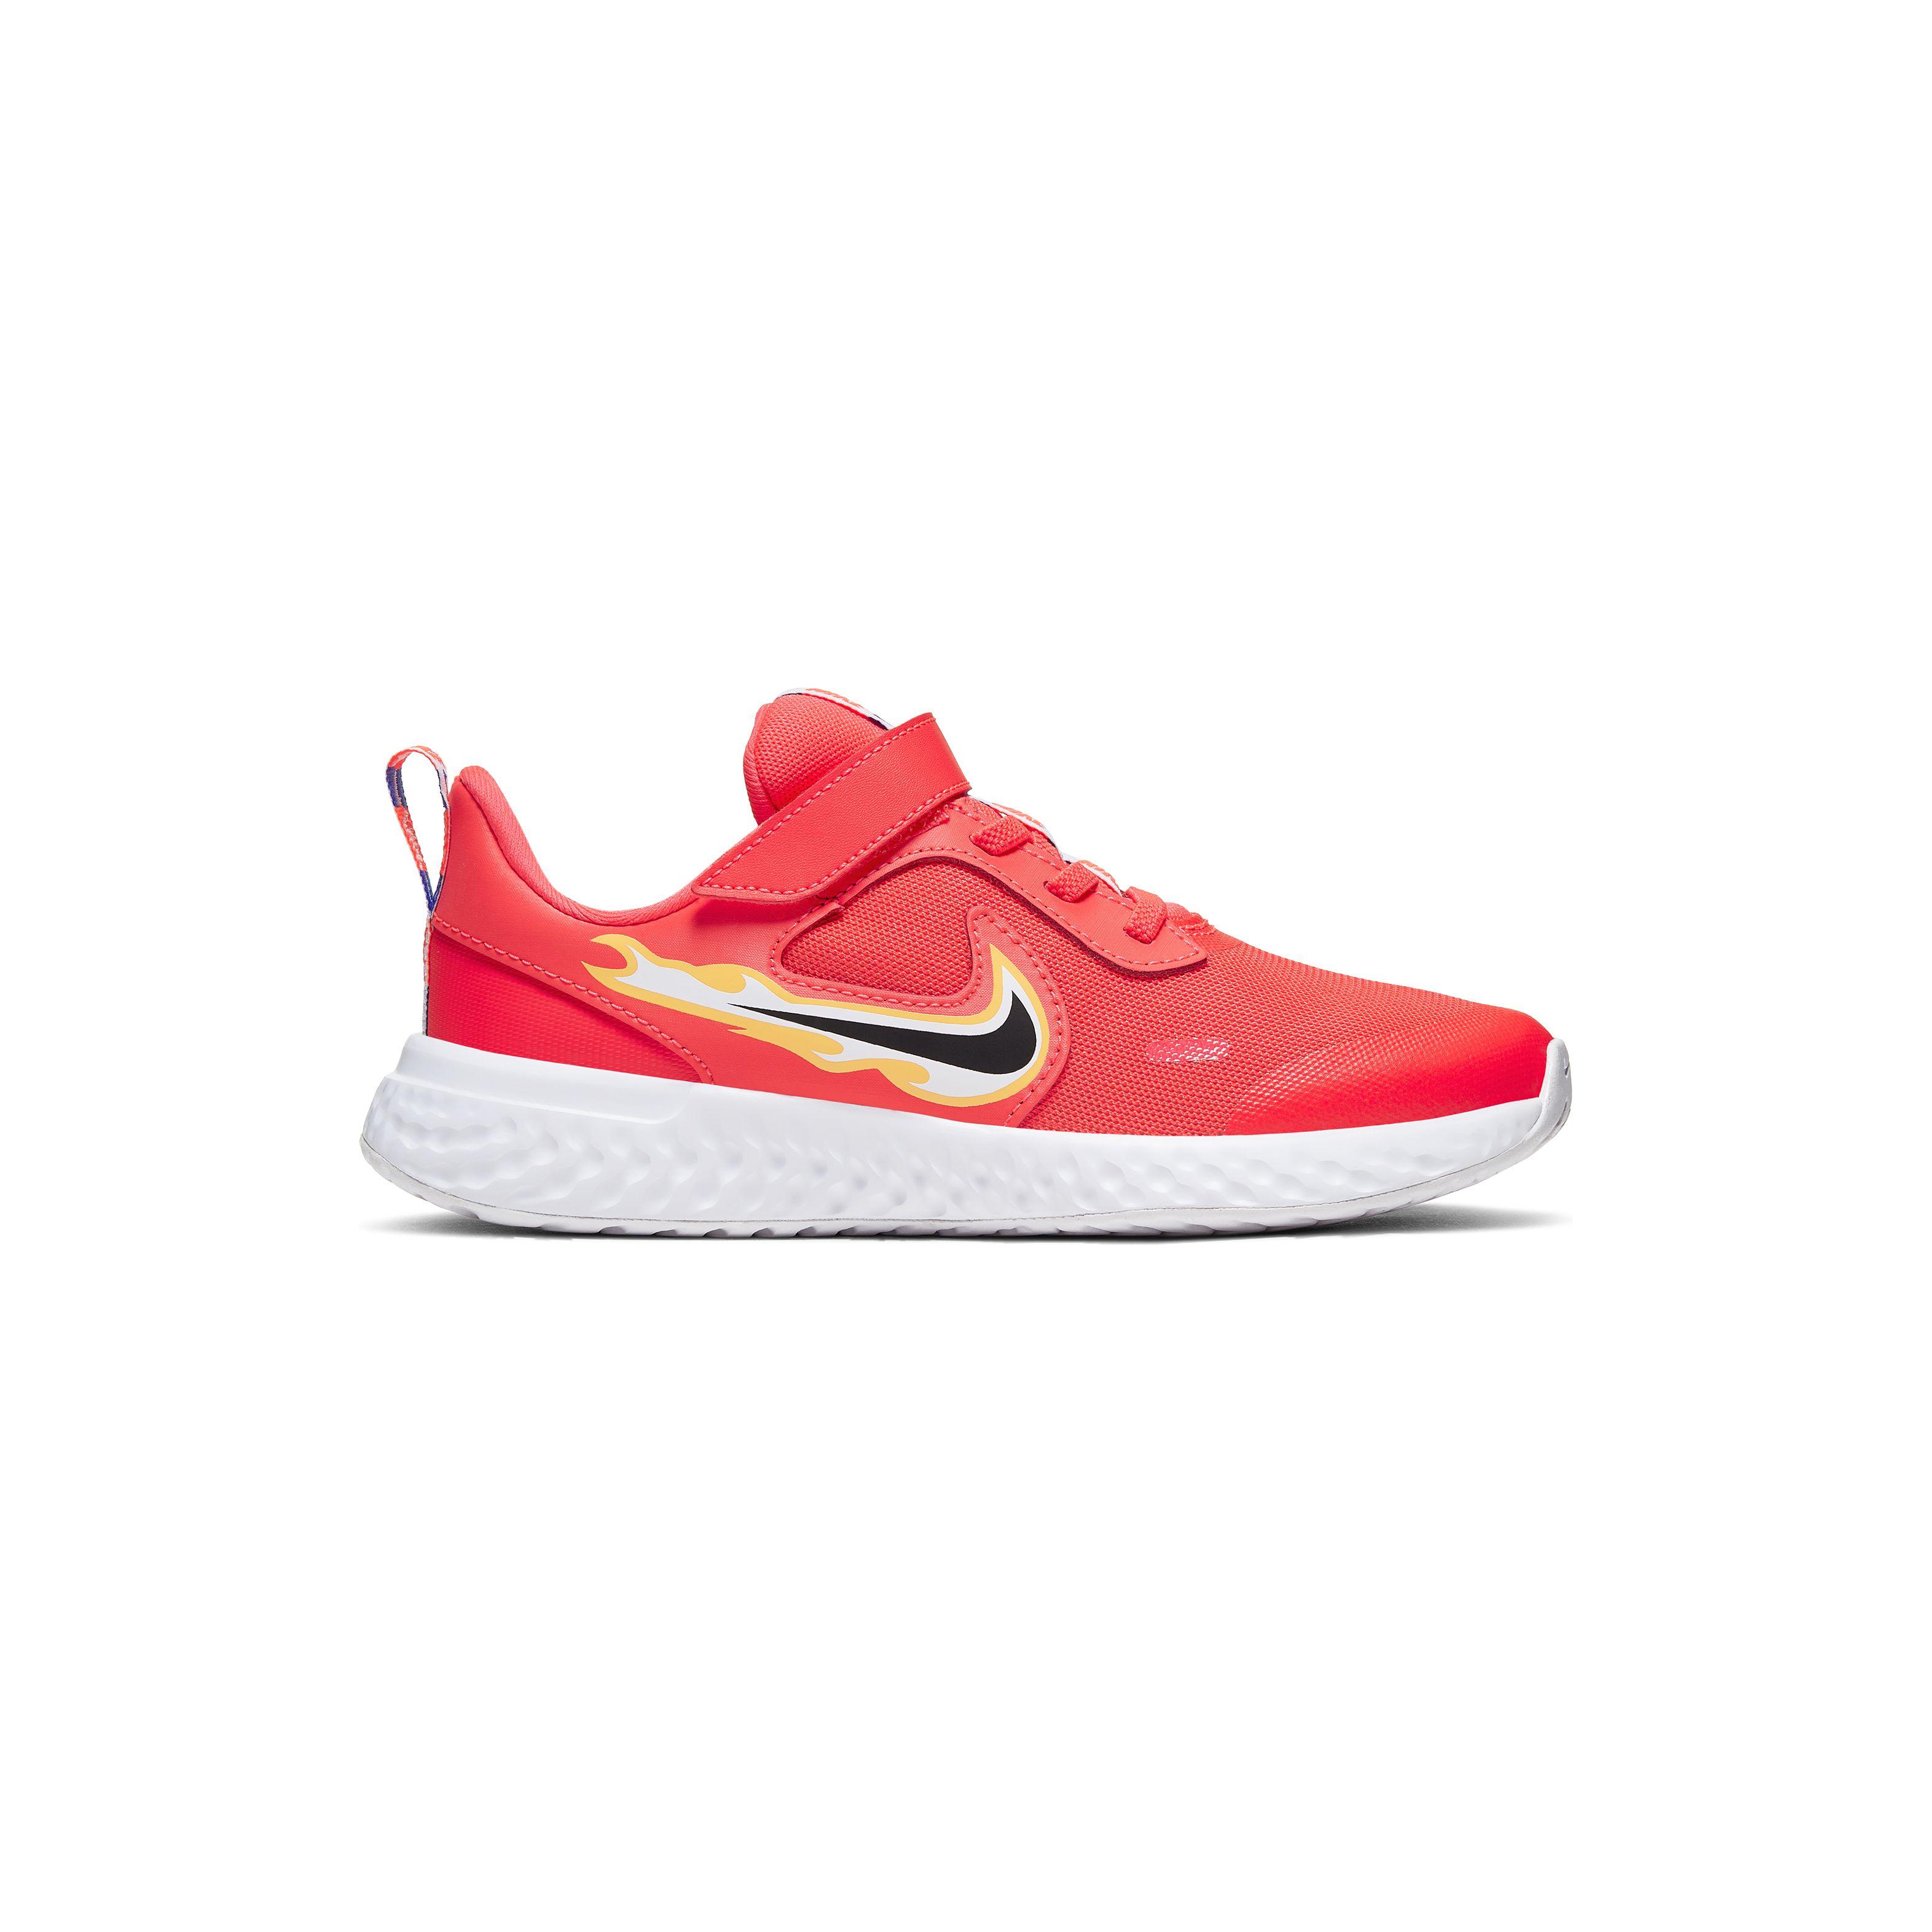 Nike revolution 5 fire (psv) LASER CRIMSON/DK SMOKE GREY-OPTI YELLOW